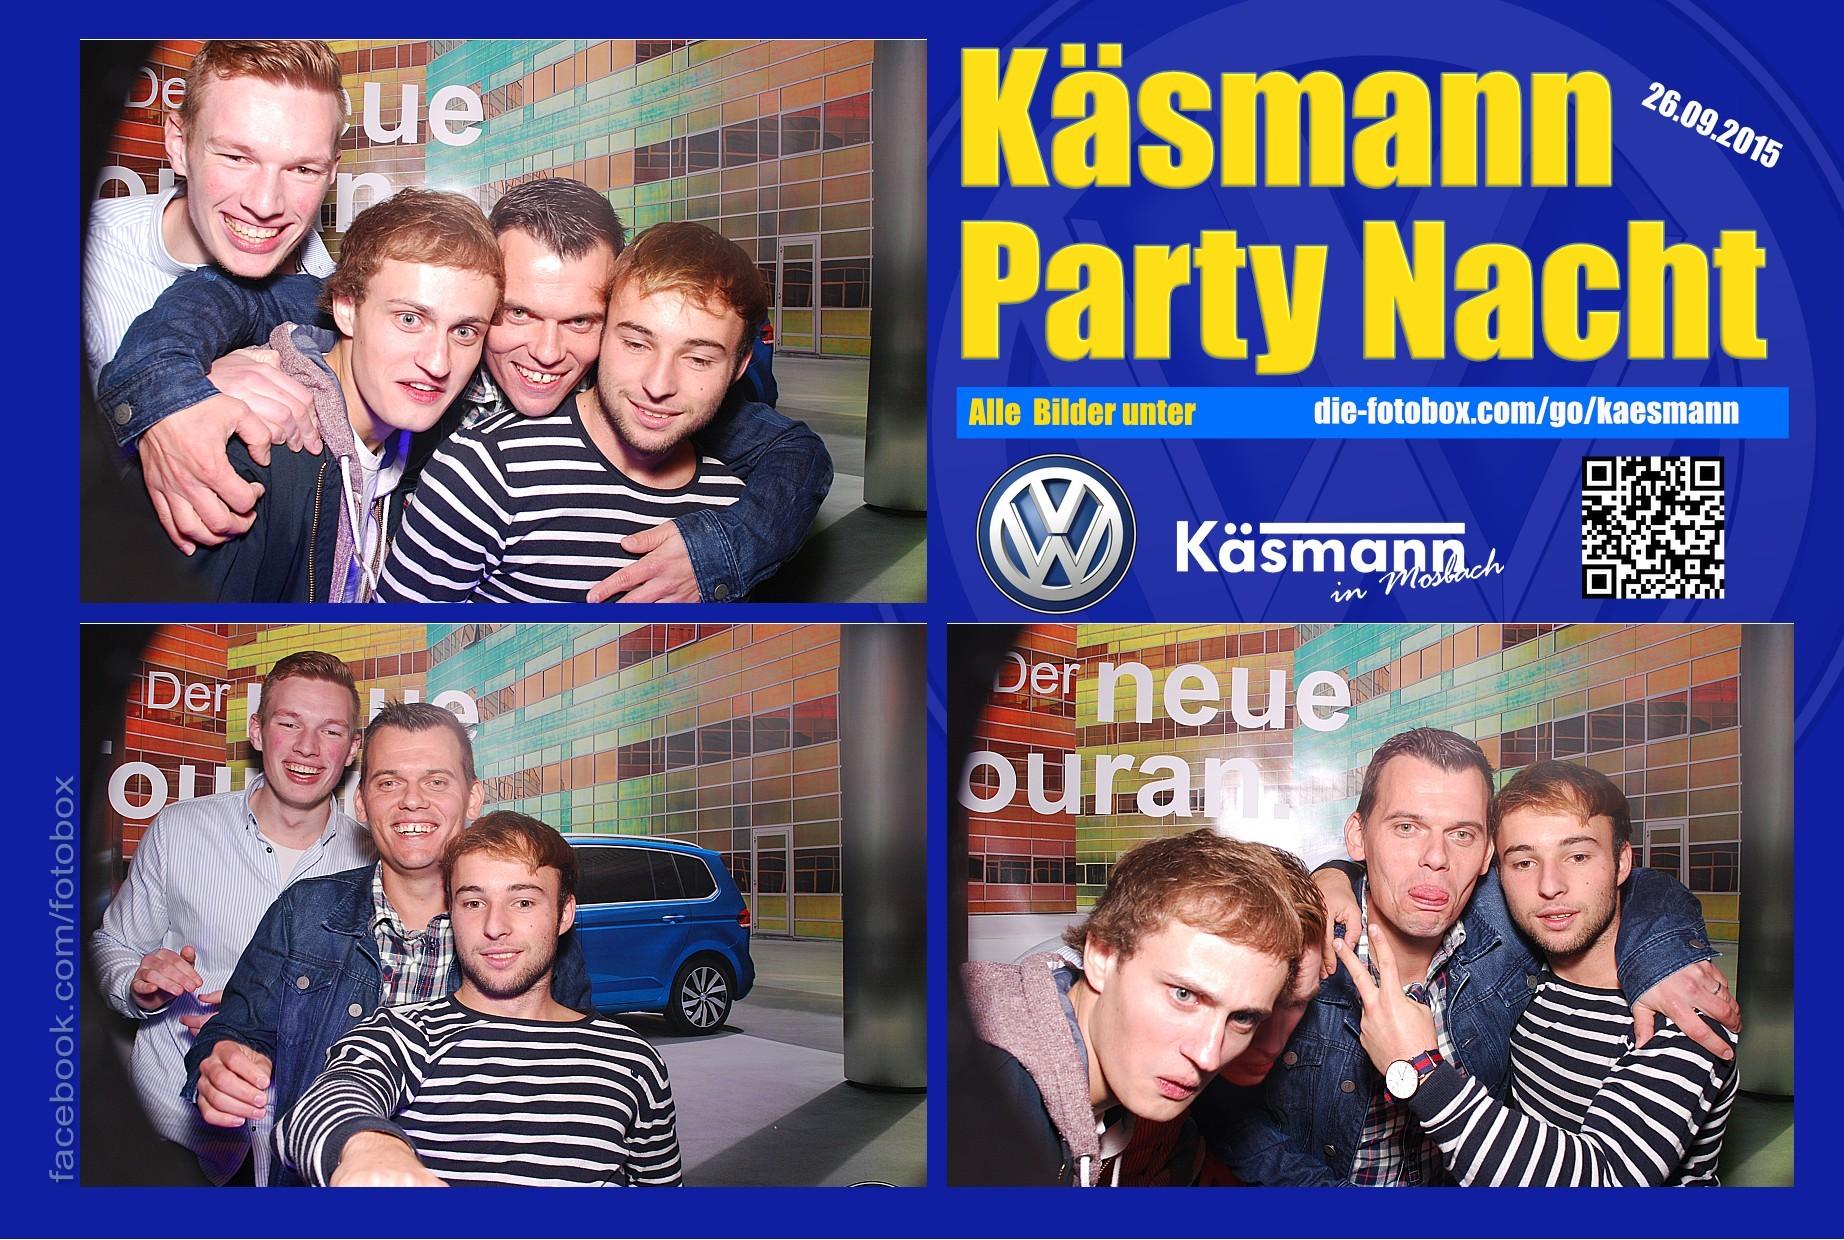 Käsmannparty 2015 - www.die-fotobox.com 01260